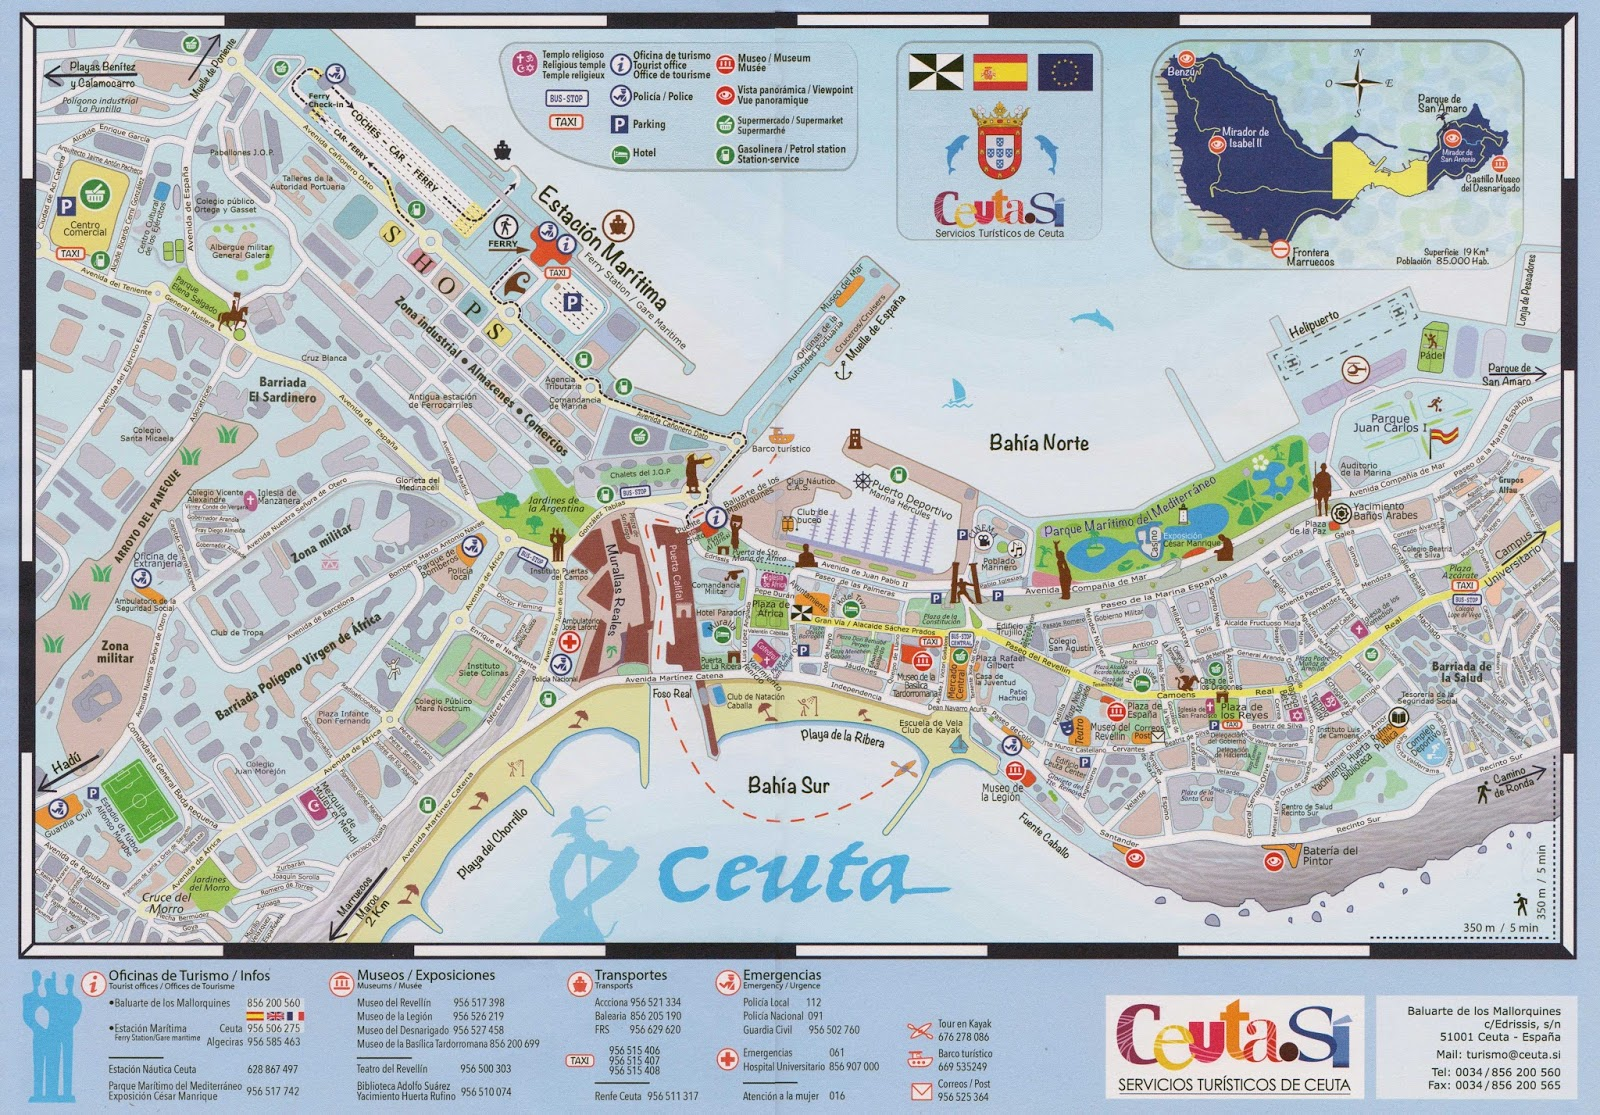 ceuta mapa Ceuta | Mapa y plano turistico | Conoceceuta ceuta mapa